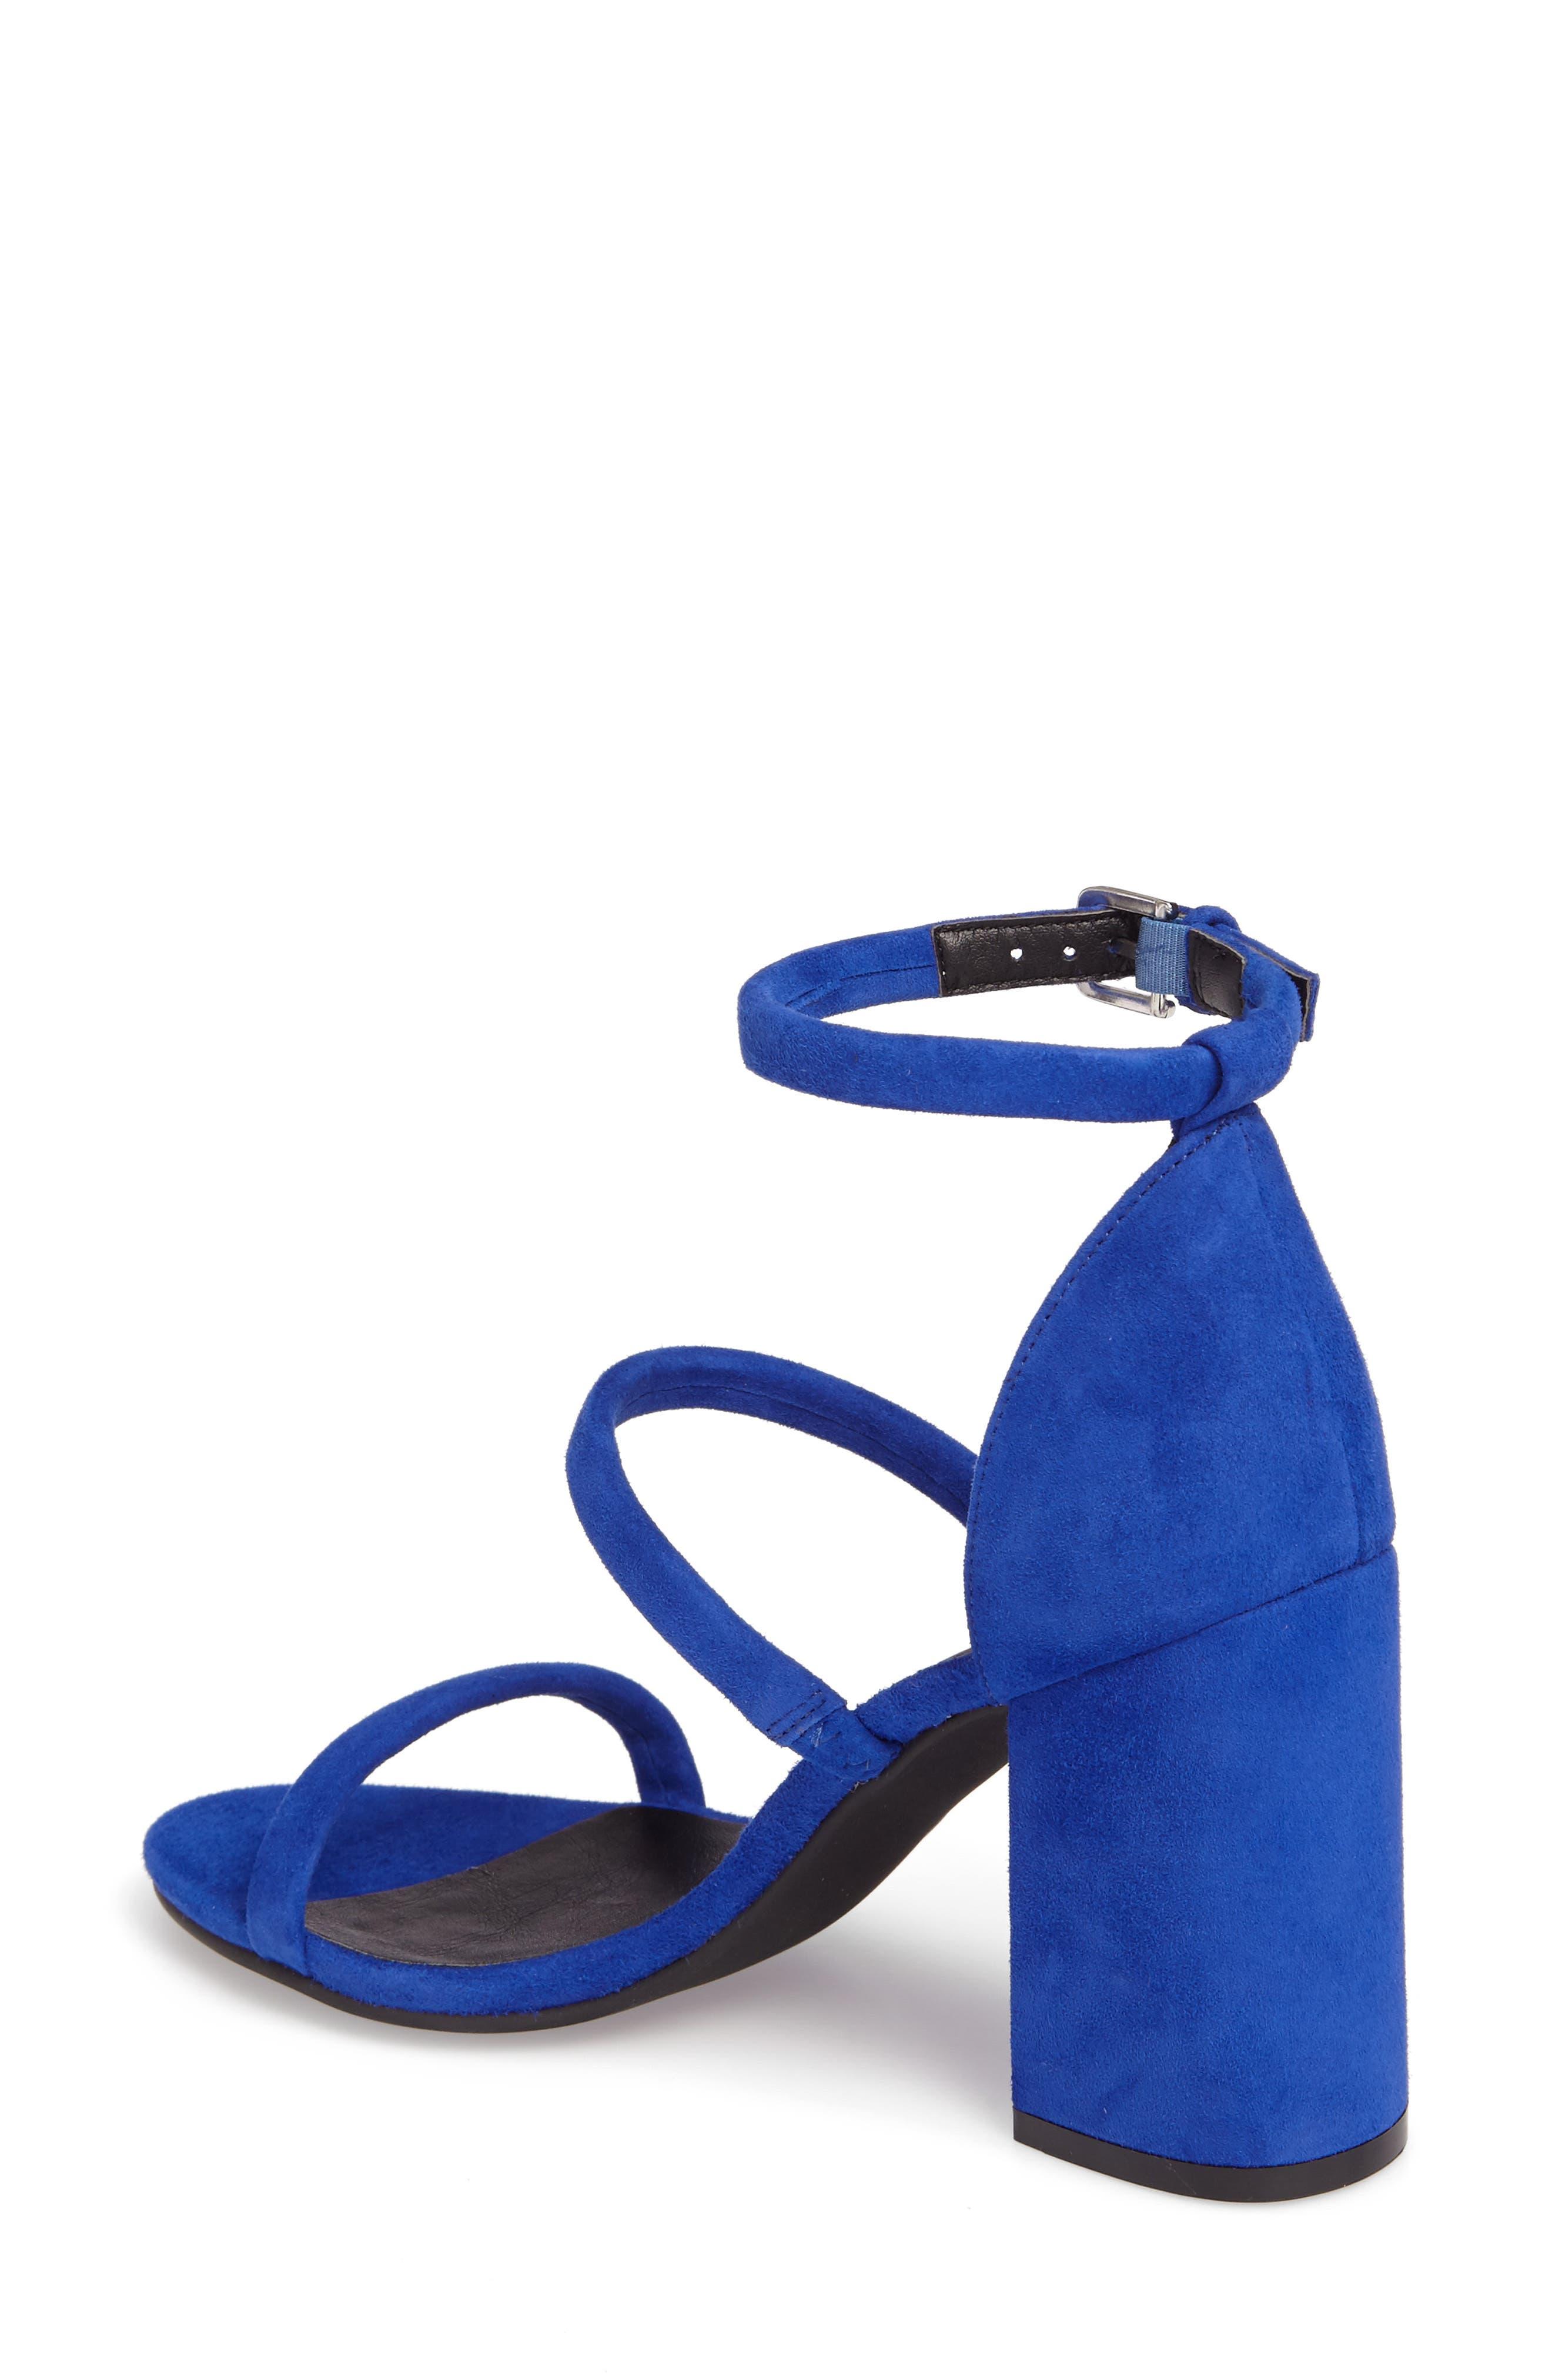 Alternate Image 2  - BP. Carly Strappy Sandal (Women)